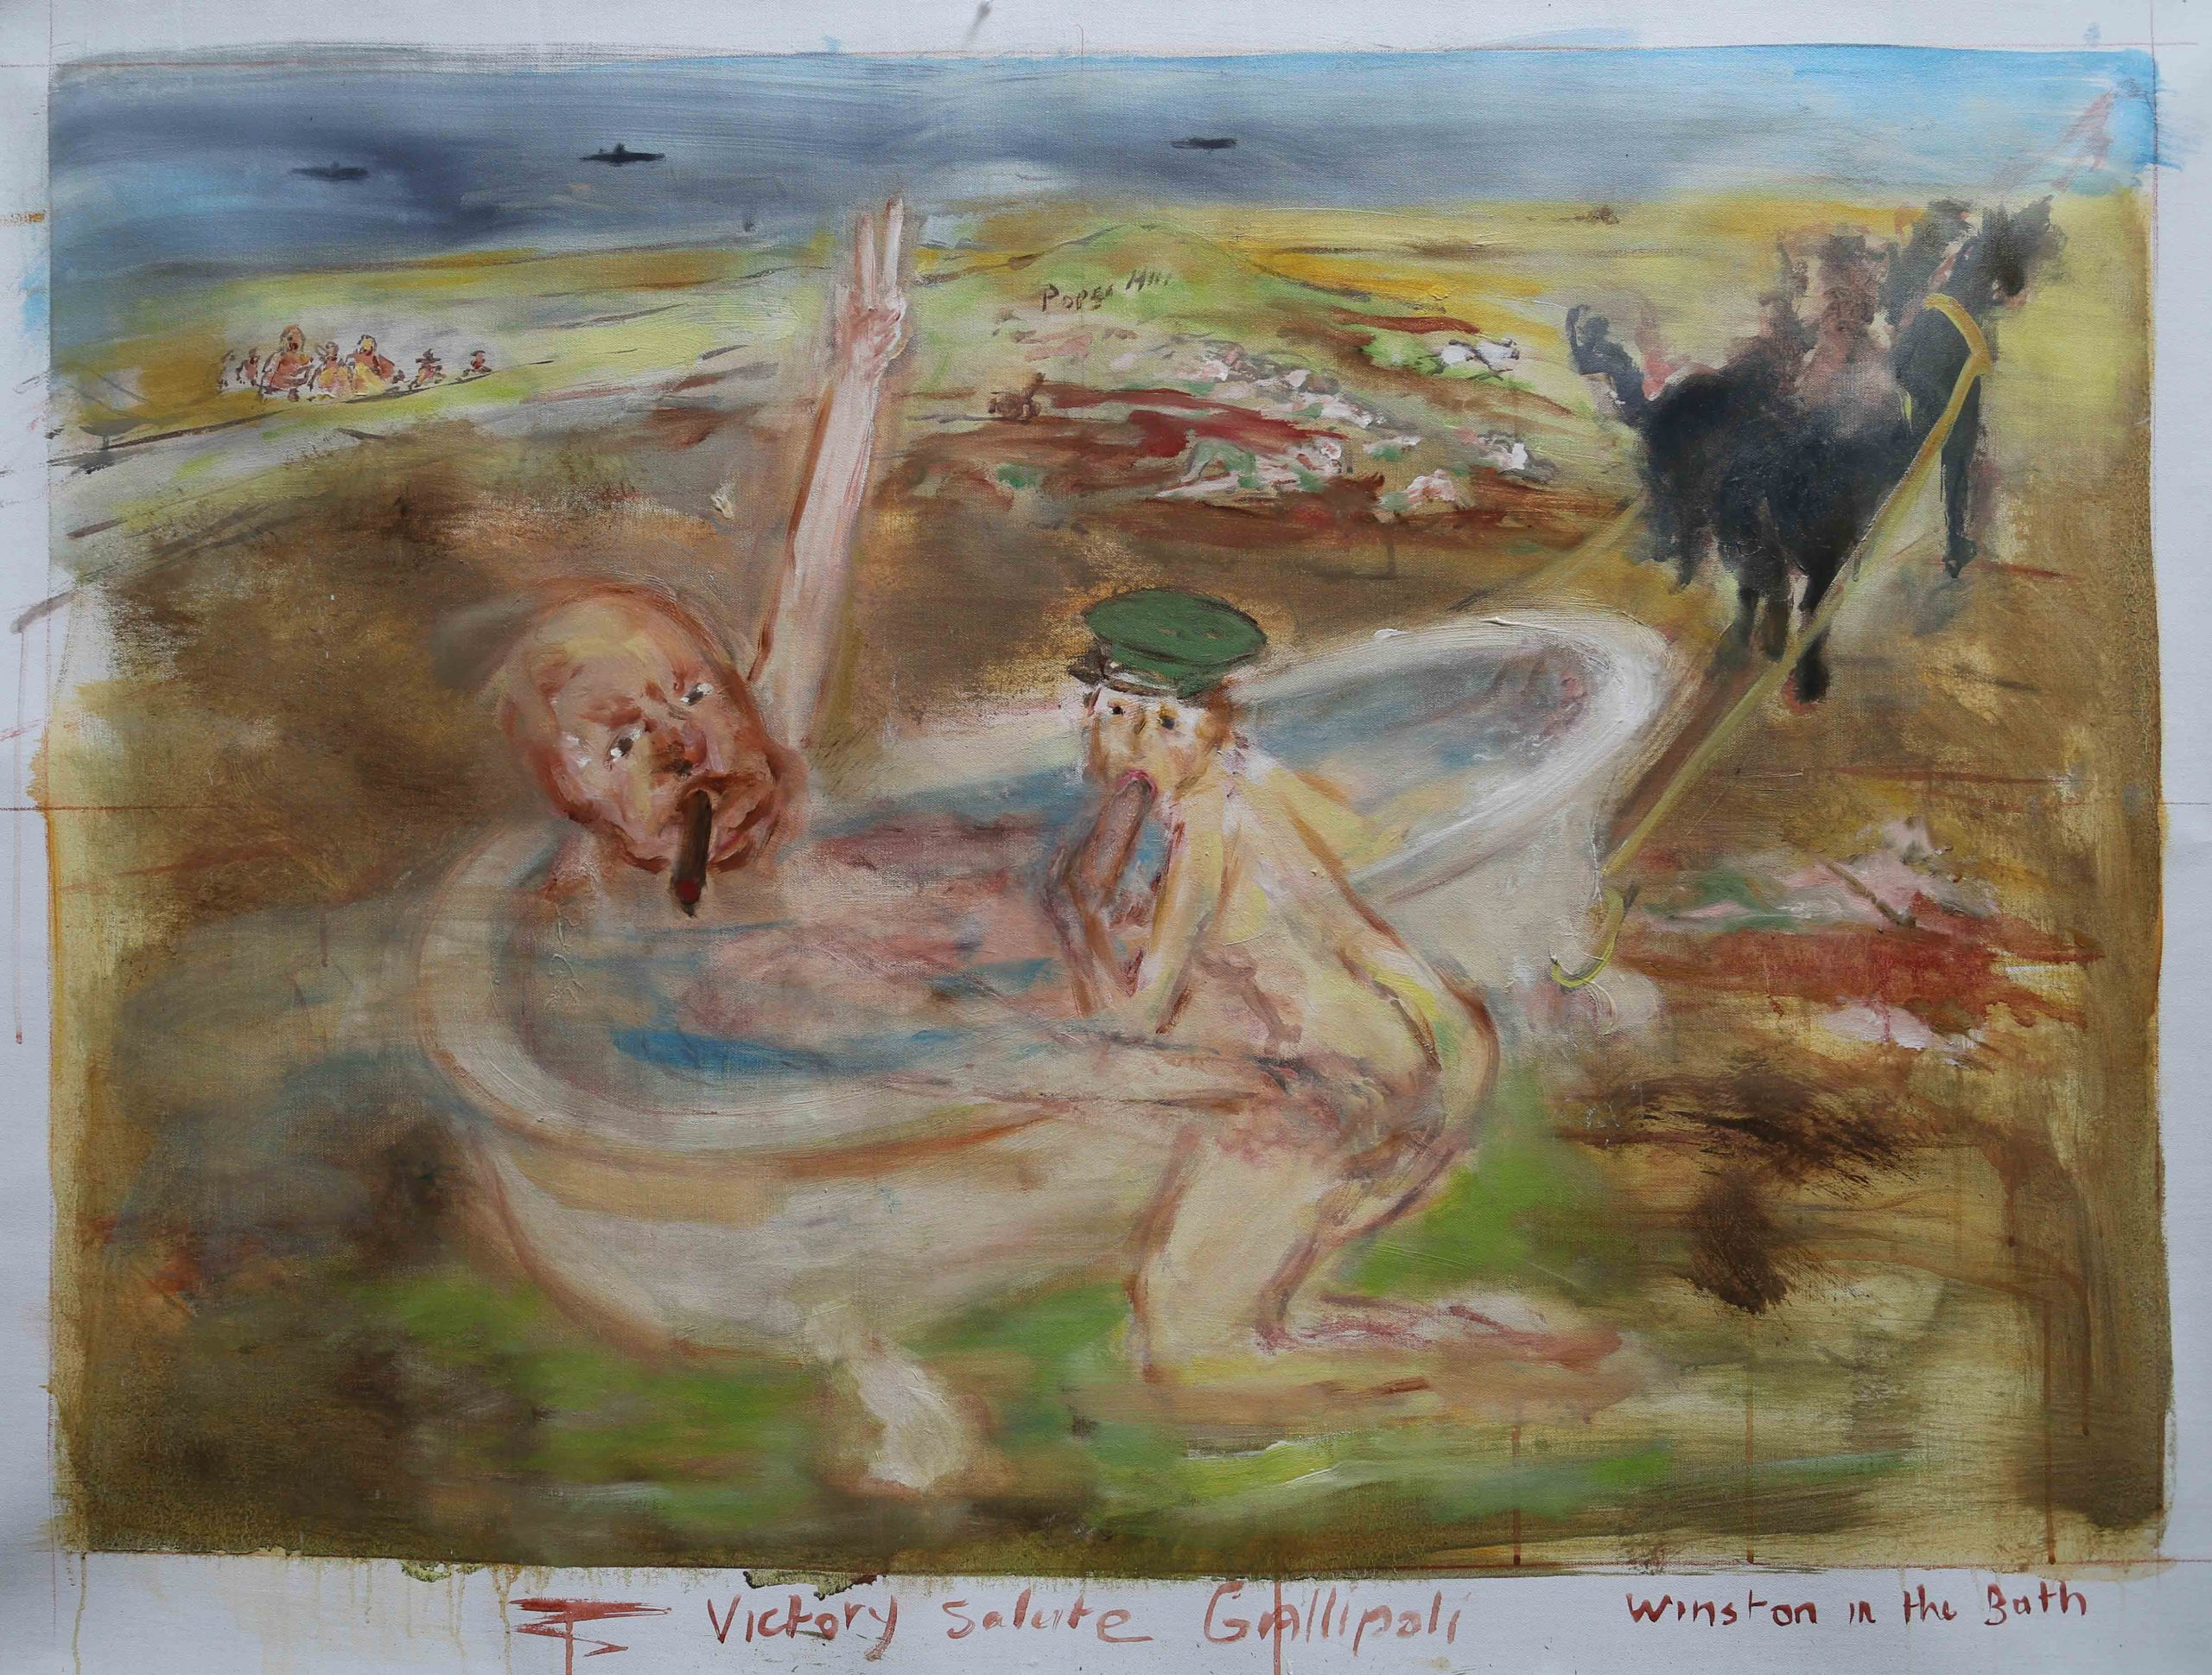 Churchill in the bath – Gallipoli 1915